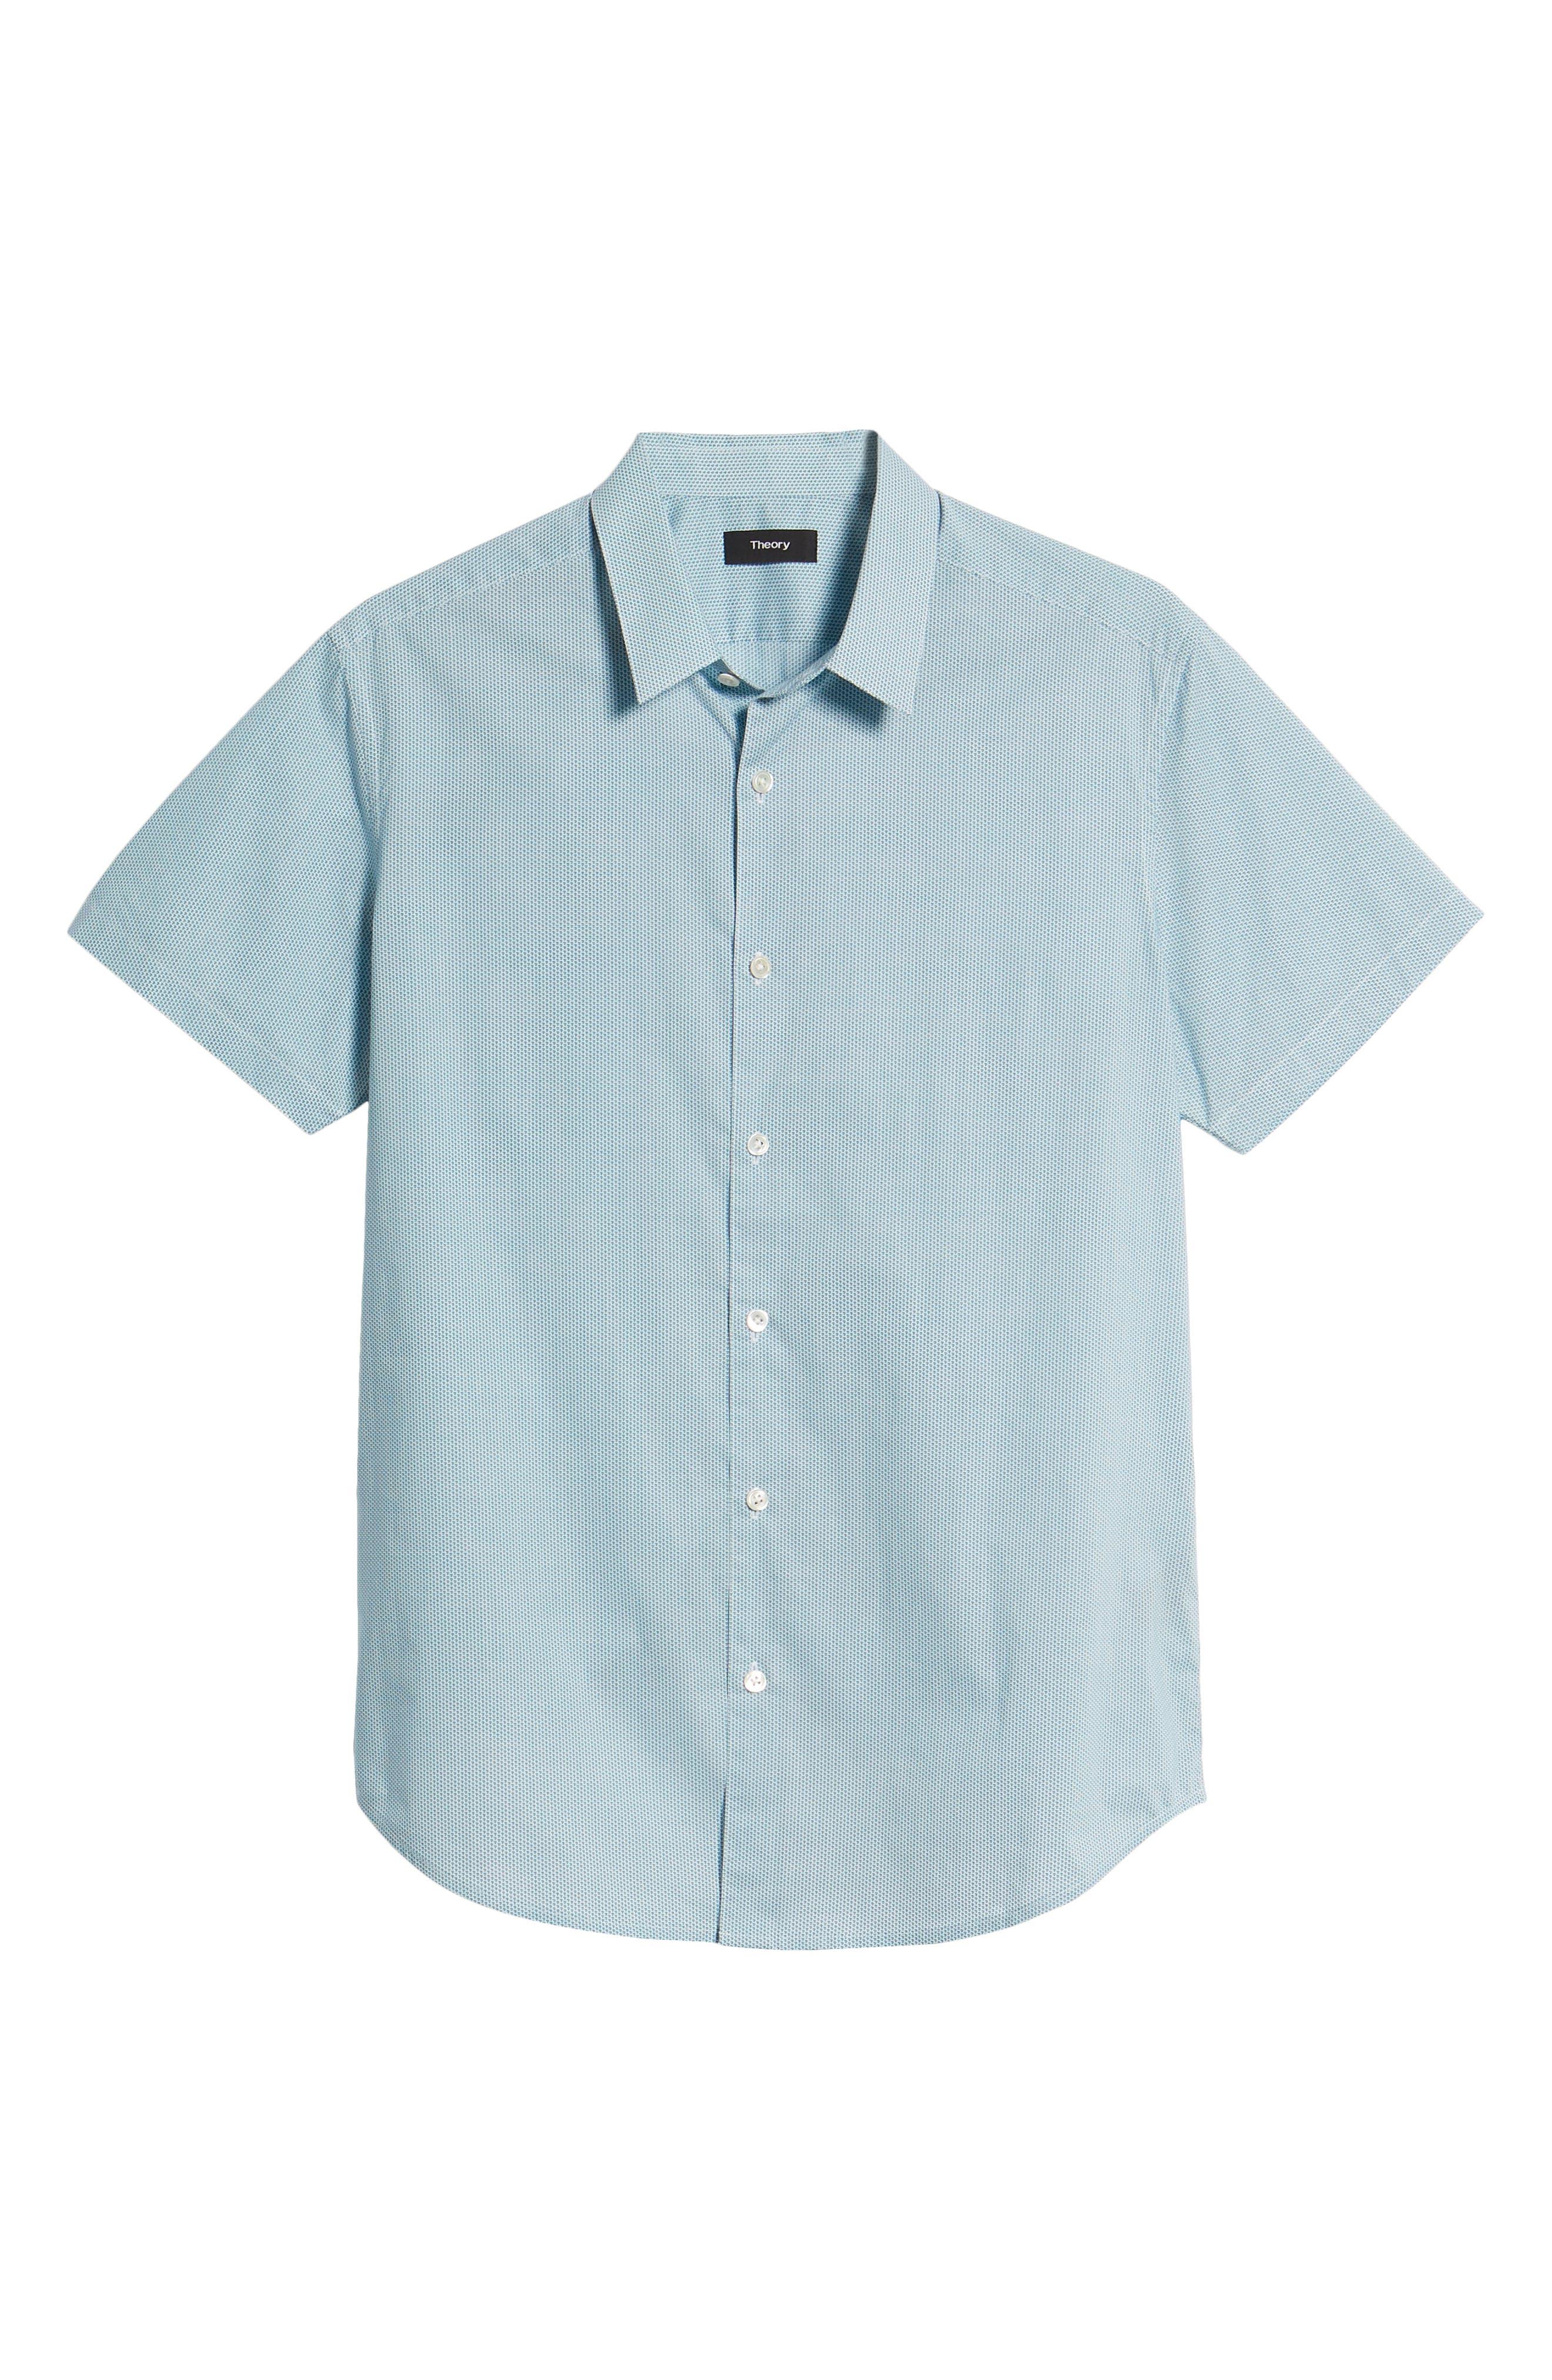 Zack Regular Fit Mini Print Sport Shirt,                             Alternate thumbnail 6, color,                             White/ Splash